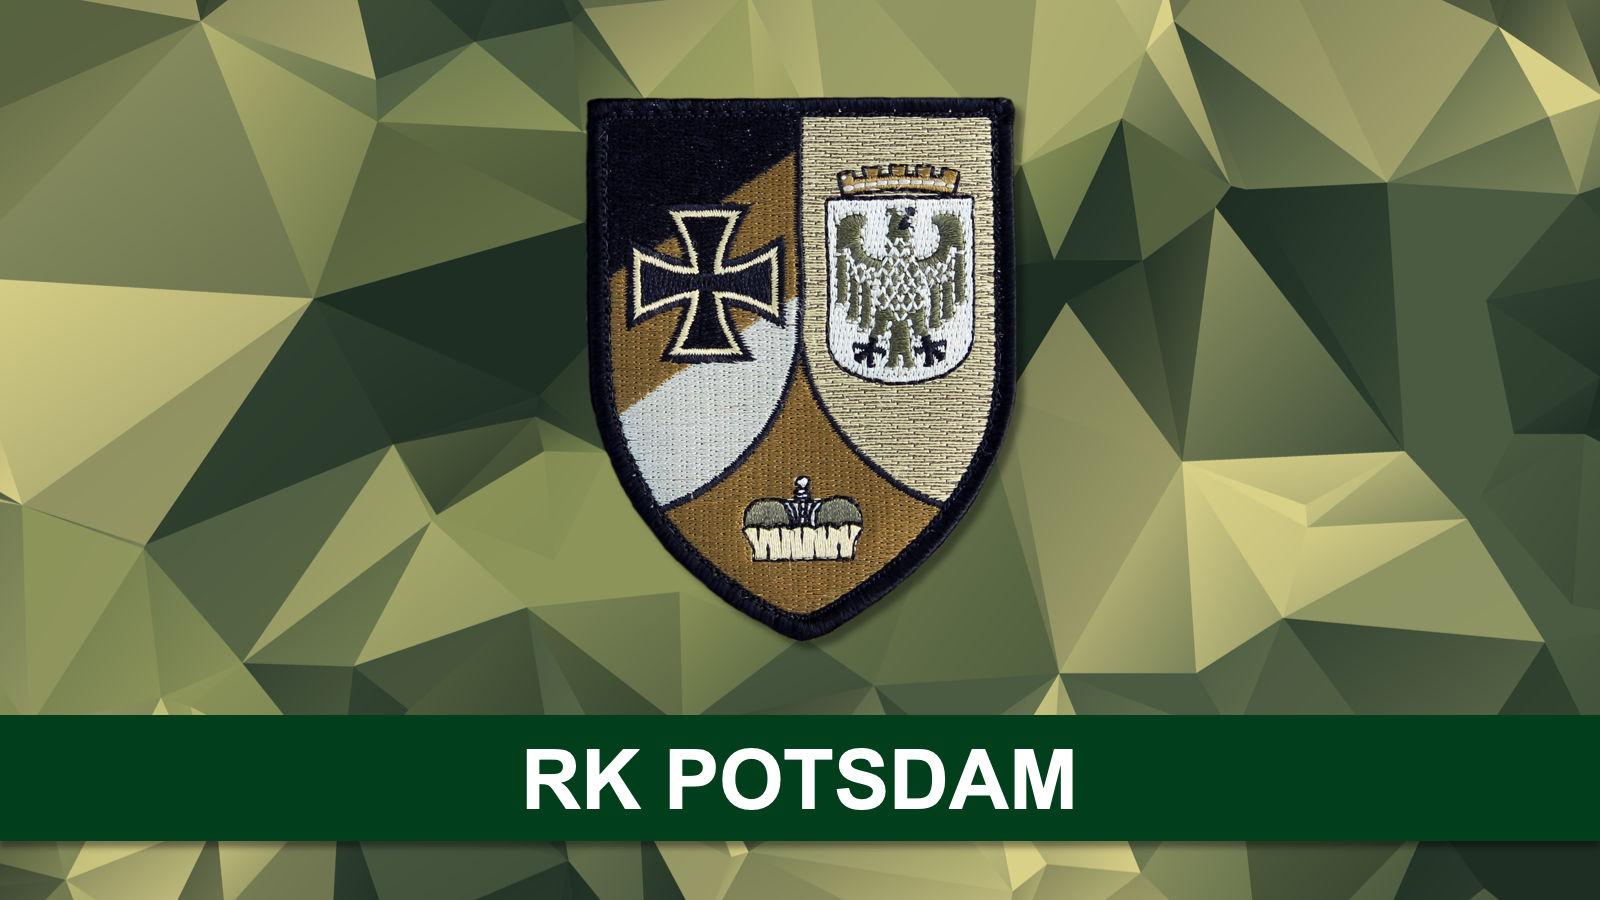 RK Potsdam